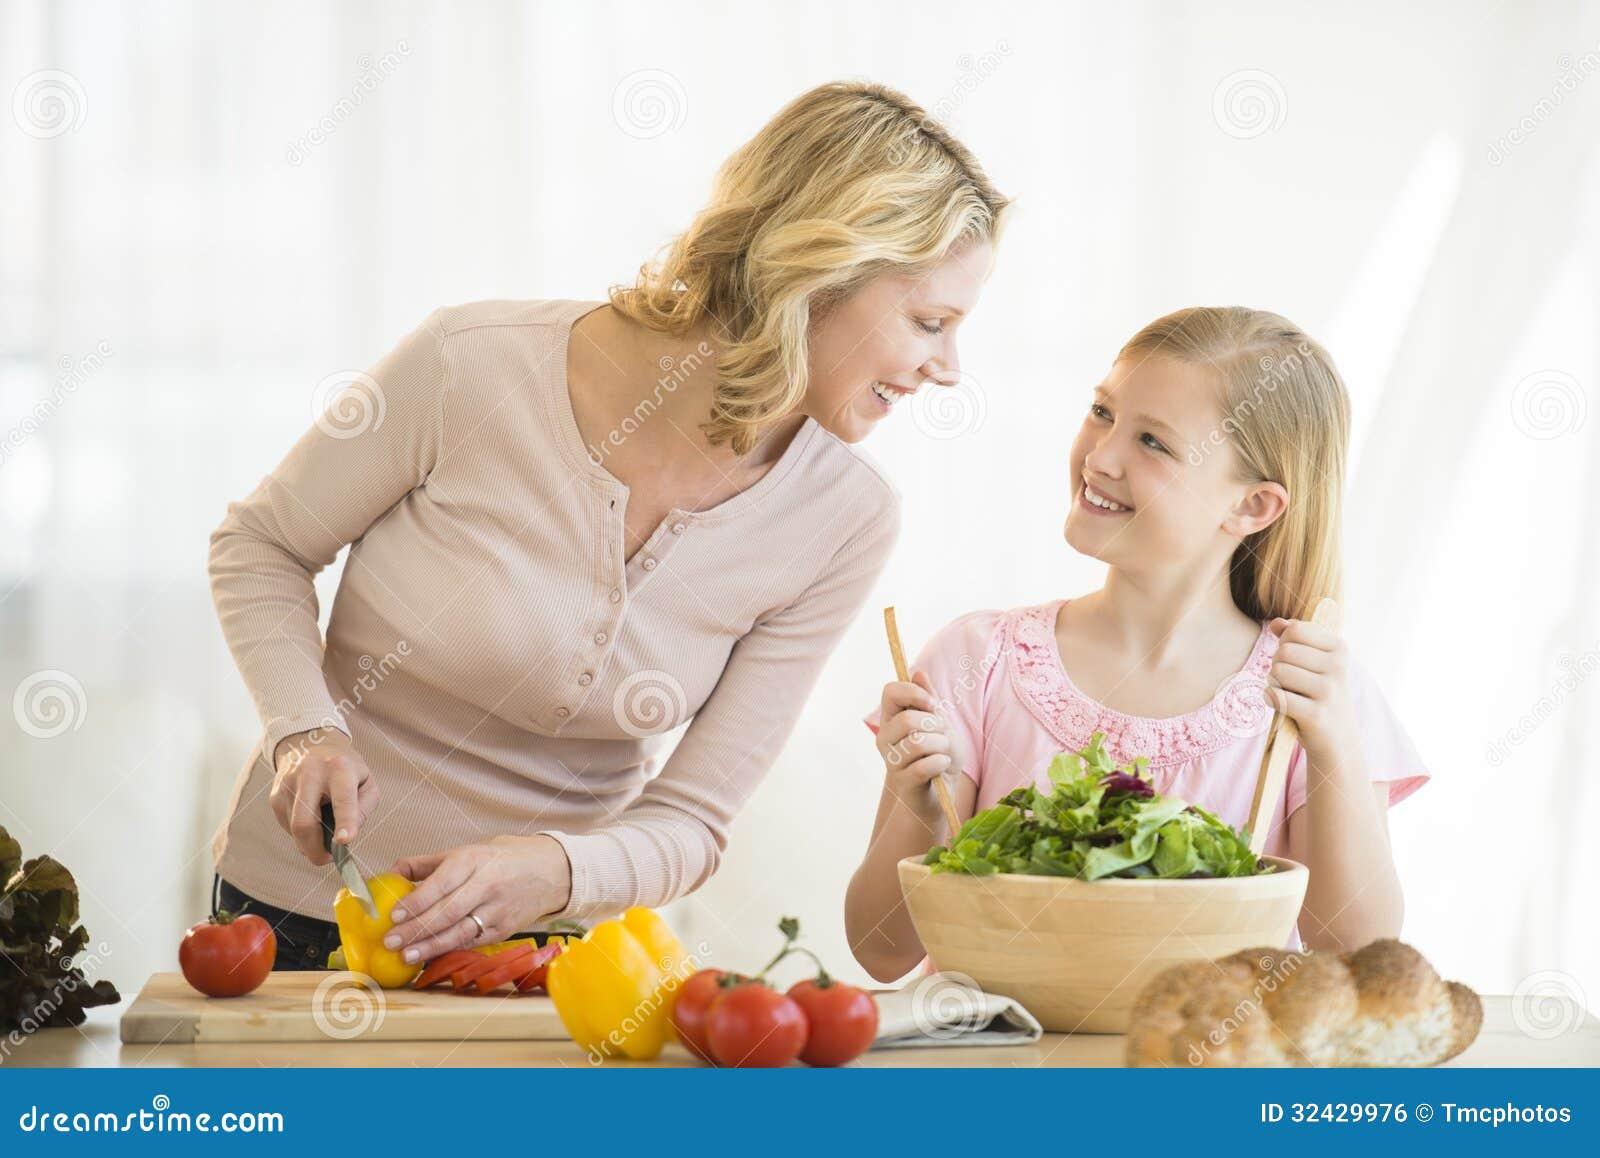 Mother daughter home plans hot girls wallpaper for Mother daughter home plans